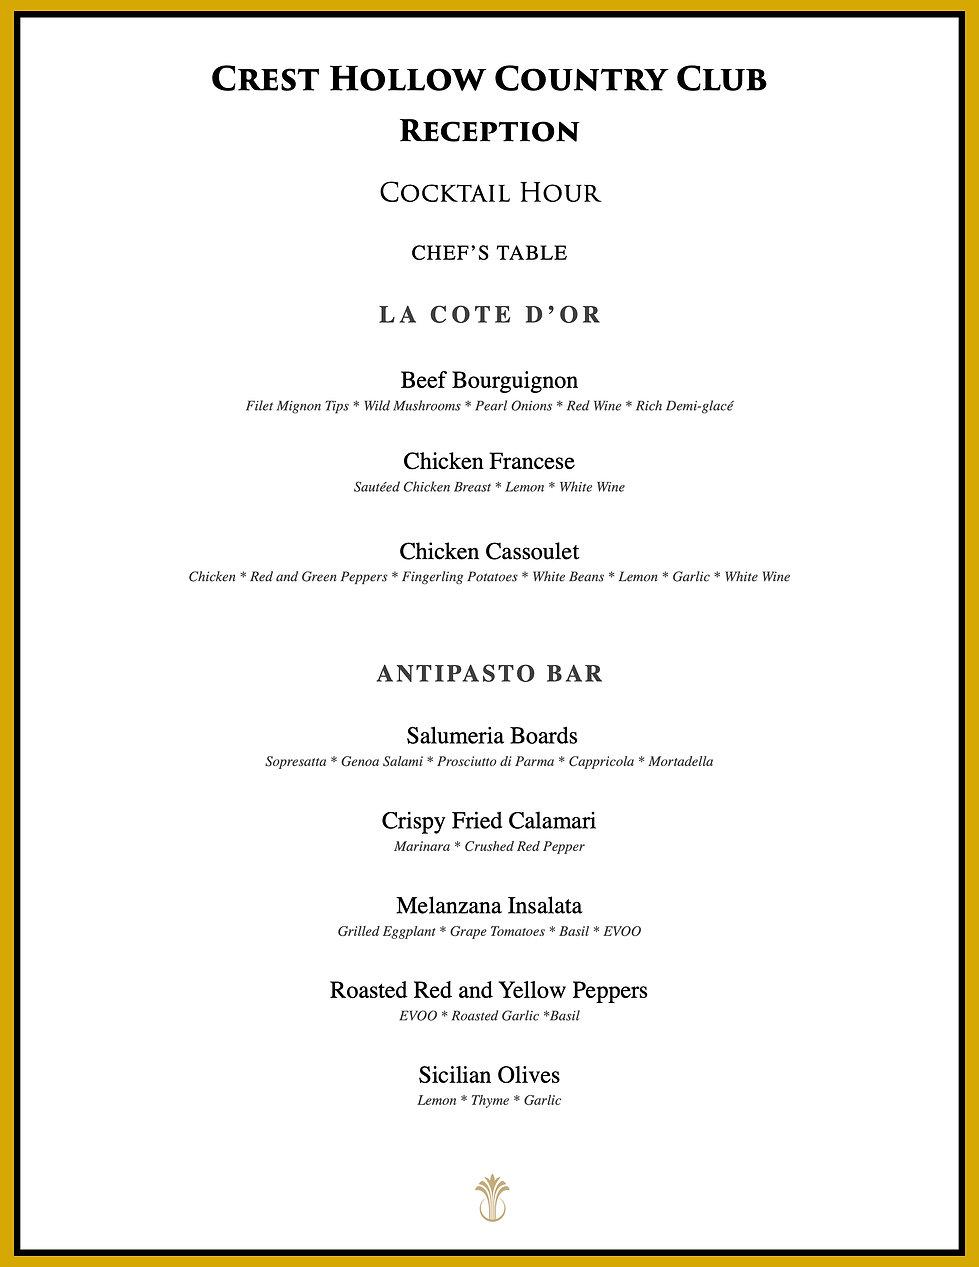 Reception Menu - Page 5.jpg